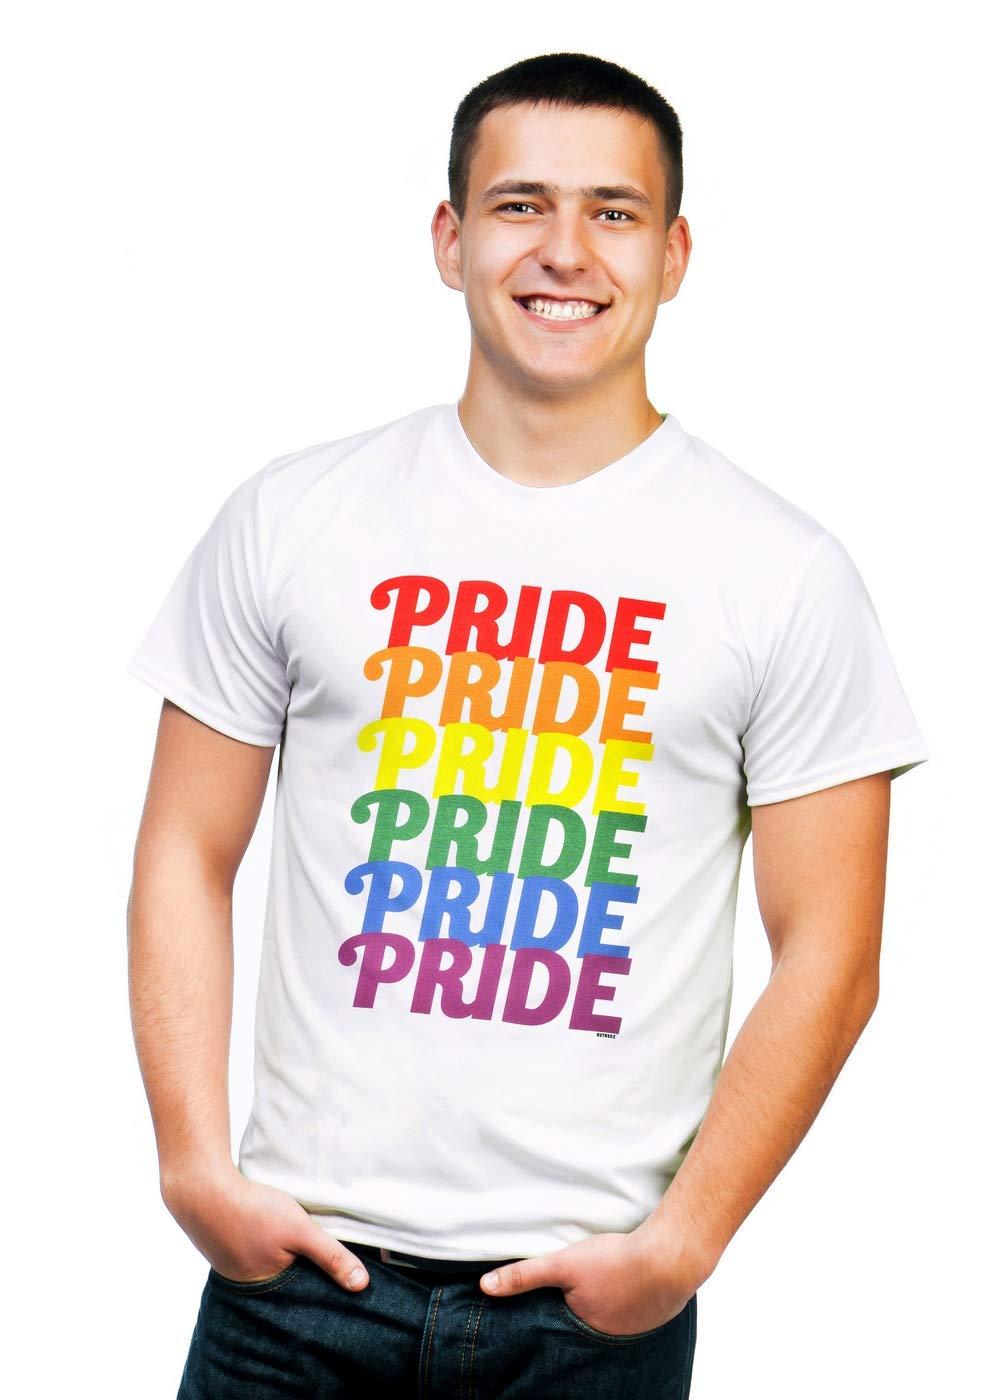 Retreez Classic Rainbow Lgbt Lgbt Lesbian Gay Pride Graphic Printed T Shirt Tee 6035